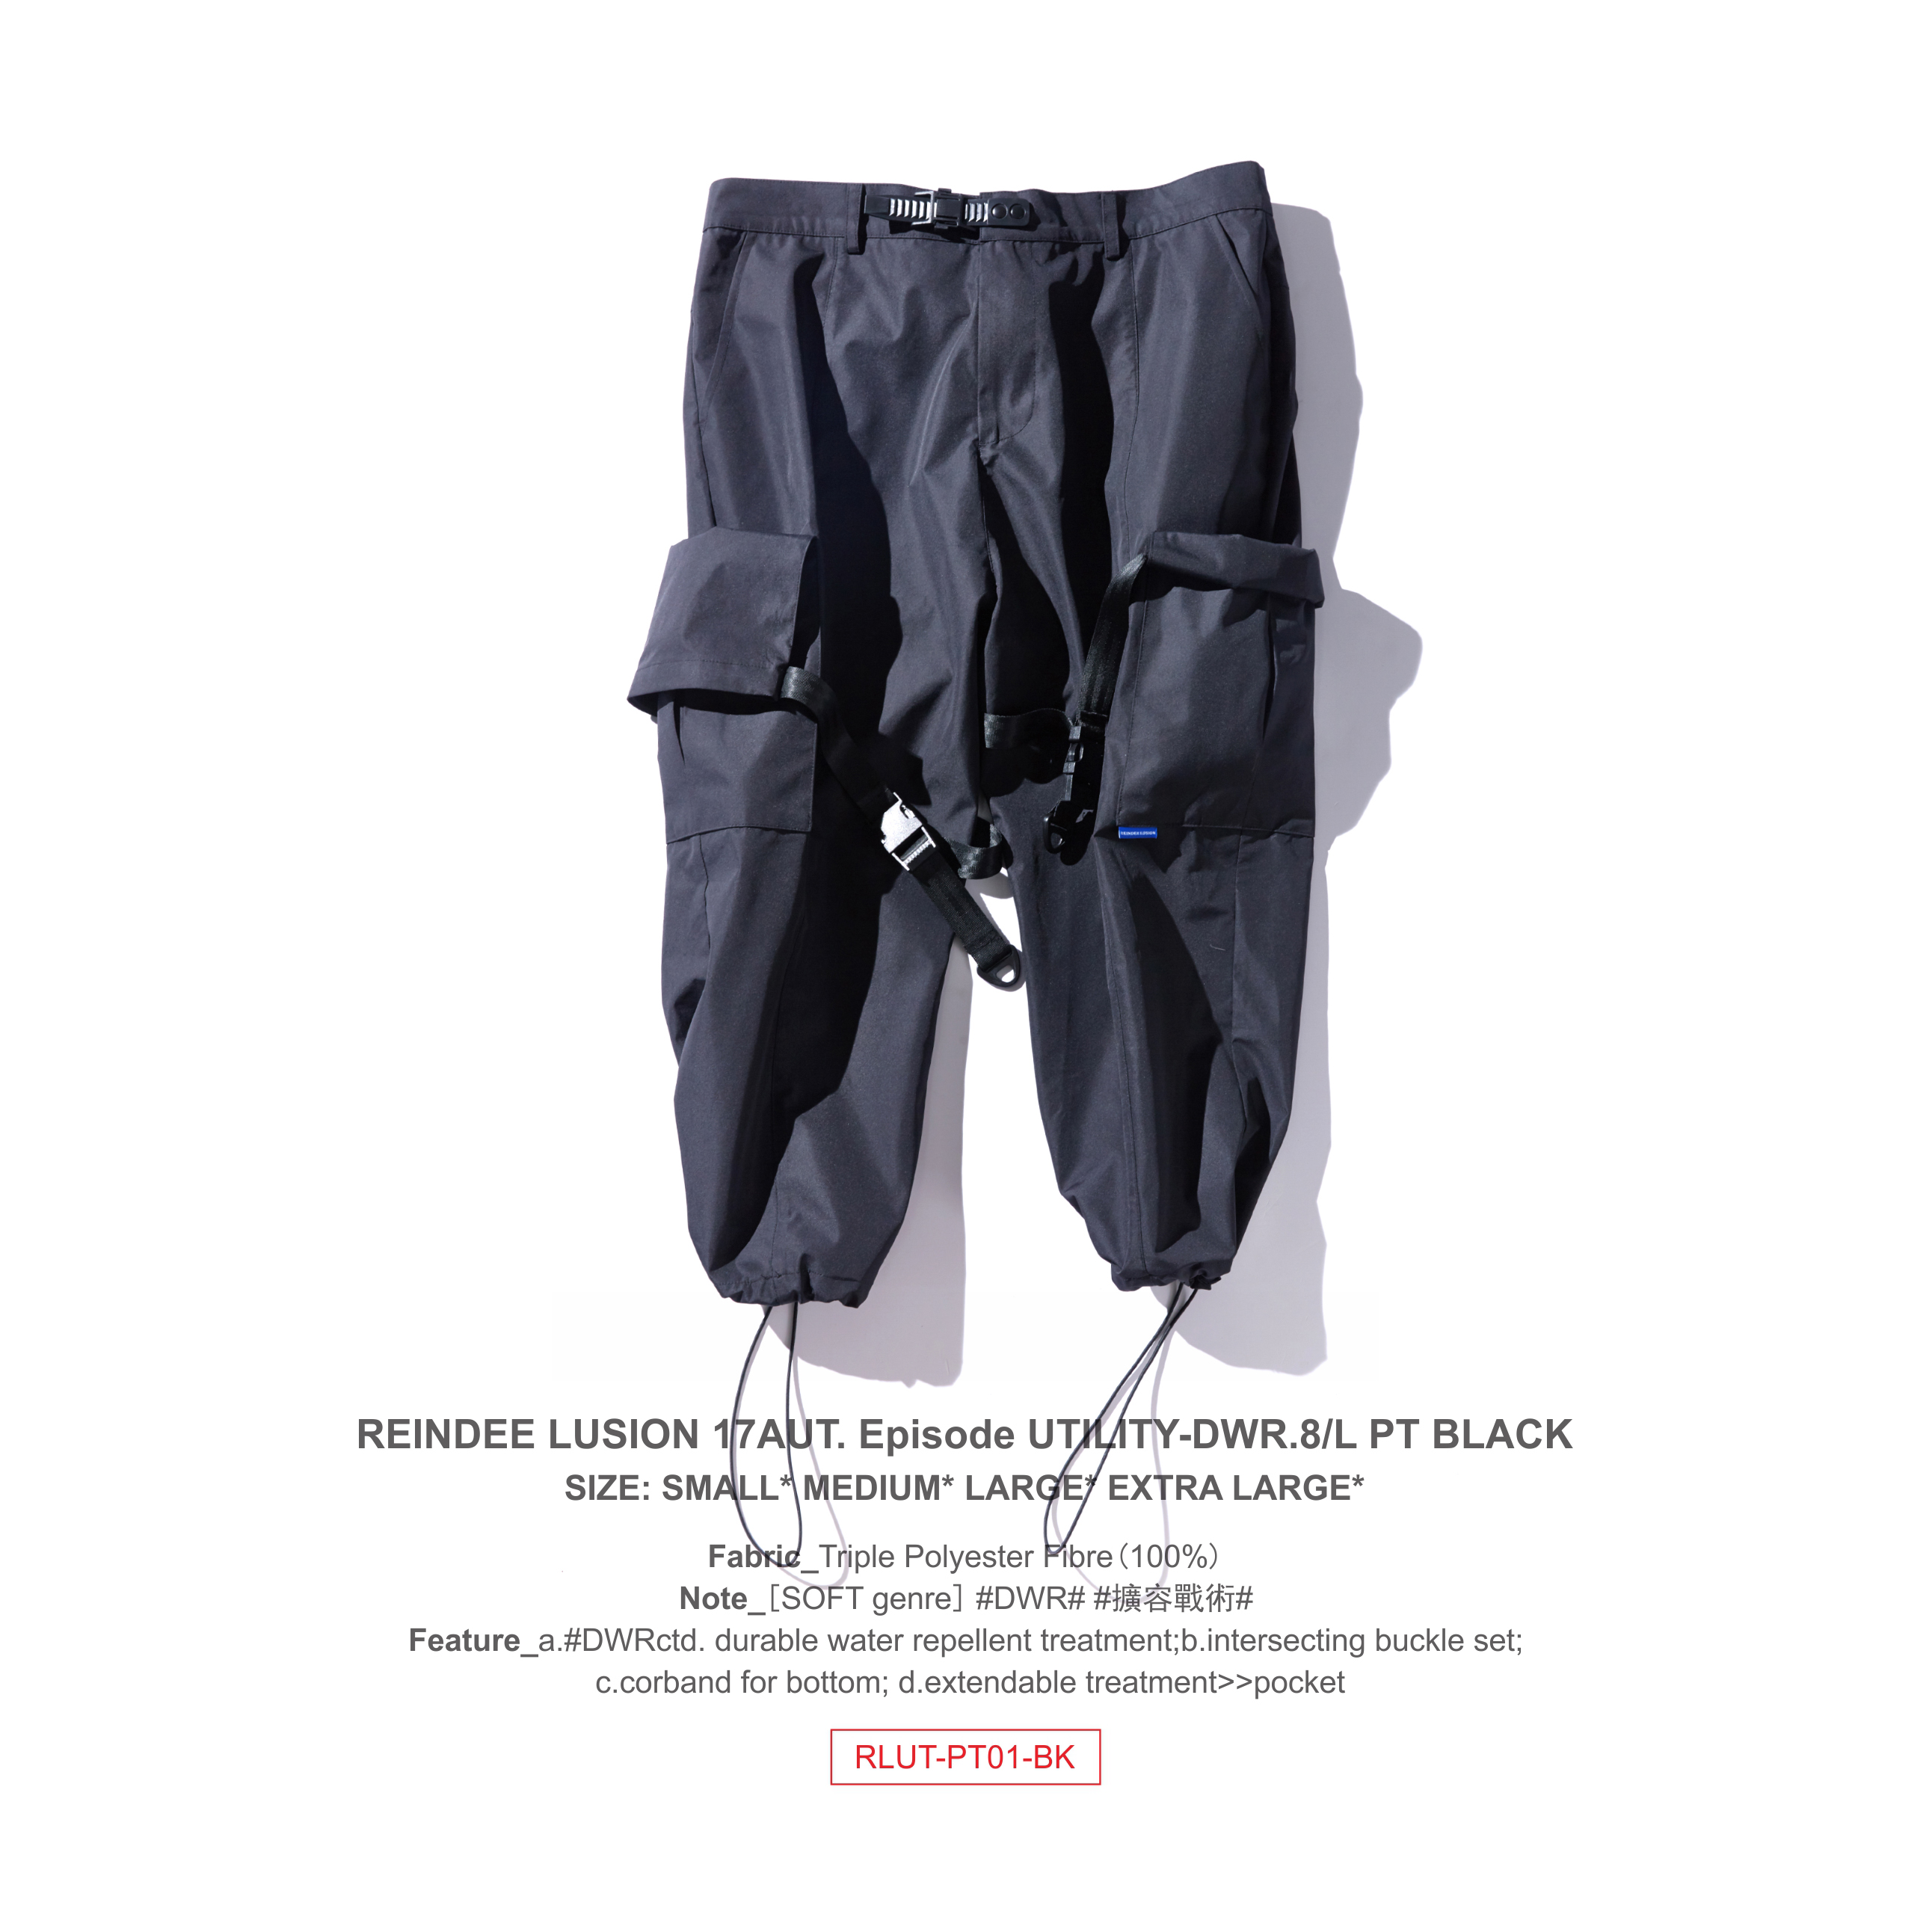 RL | REINDEE LUSION 可扩容口袋防水机能八分裤